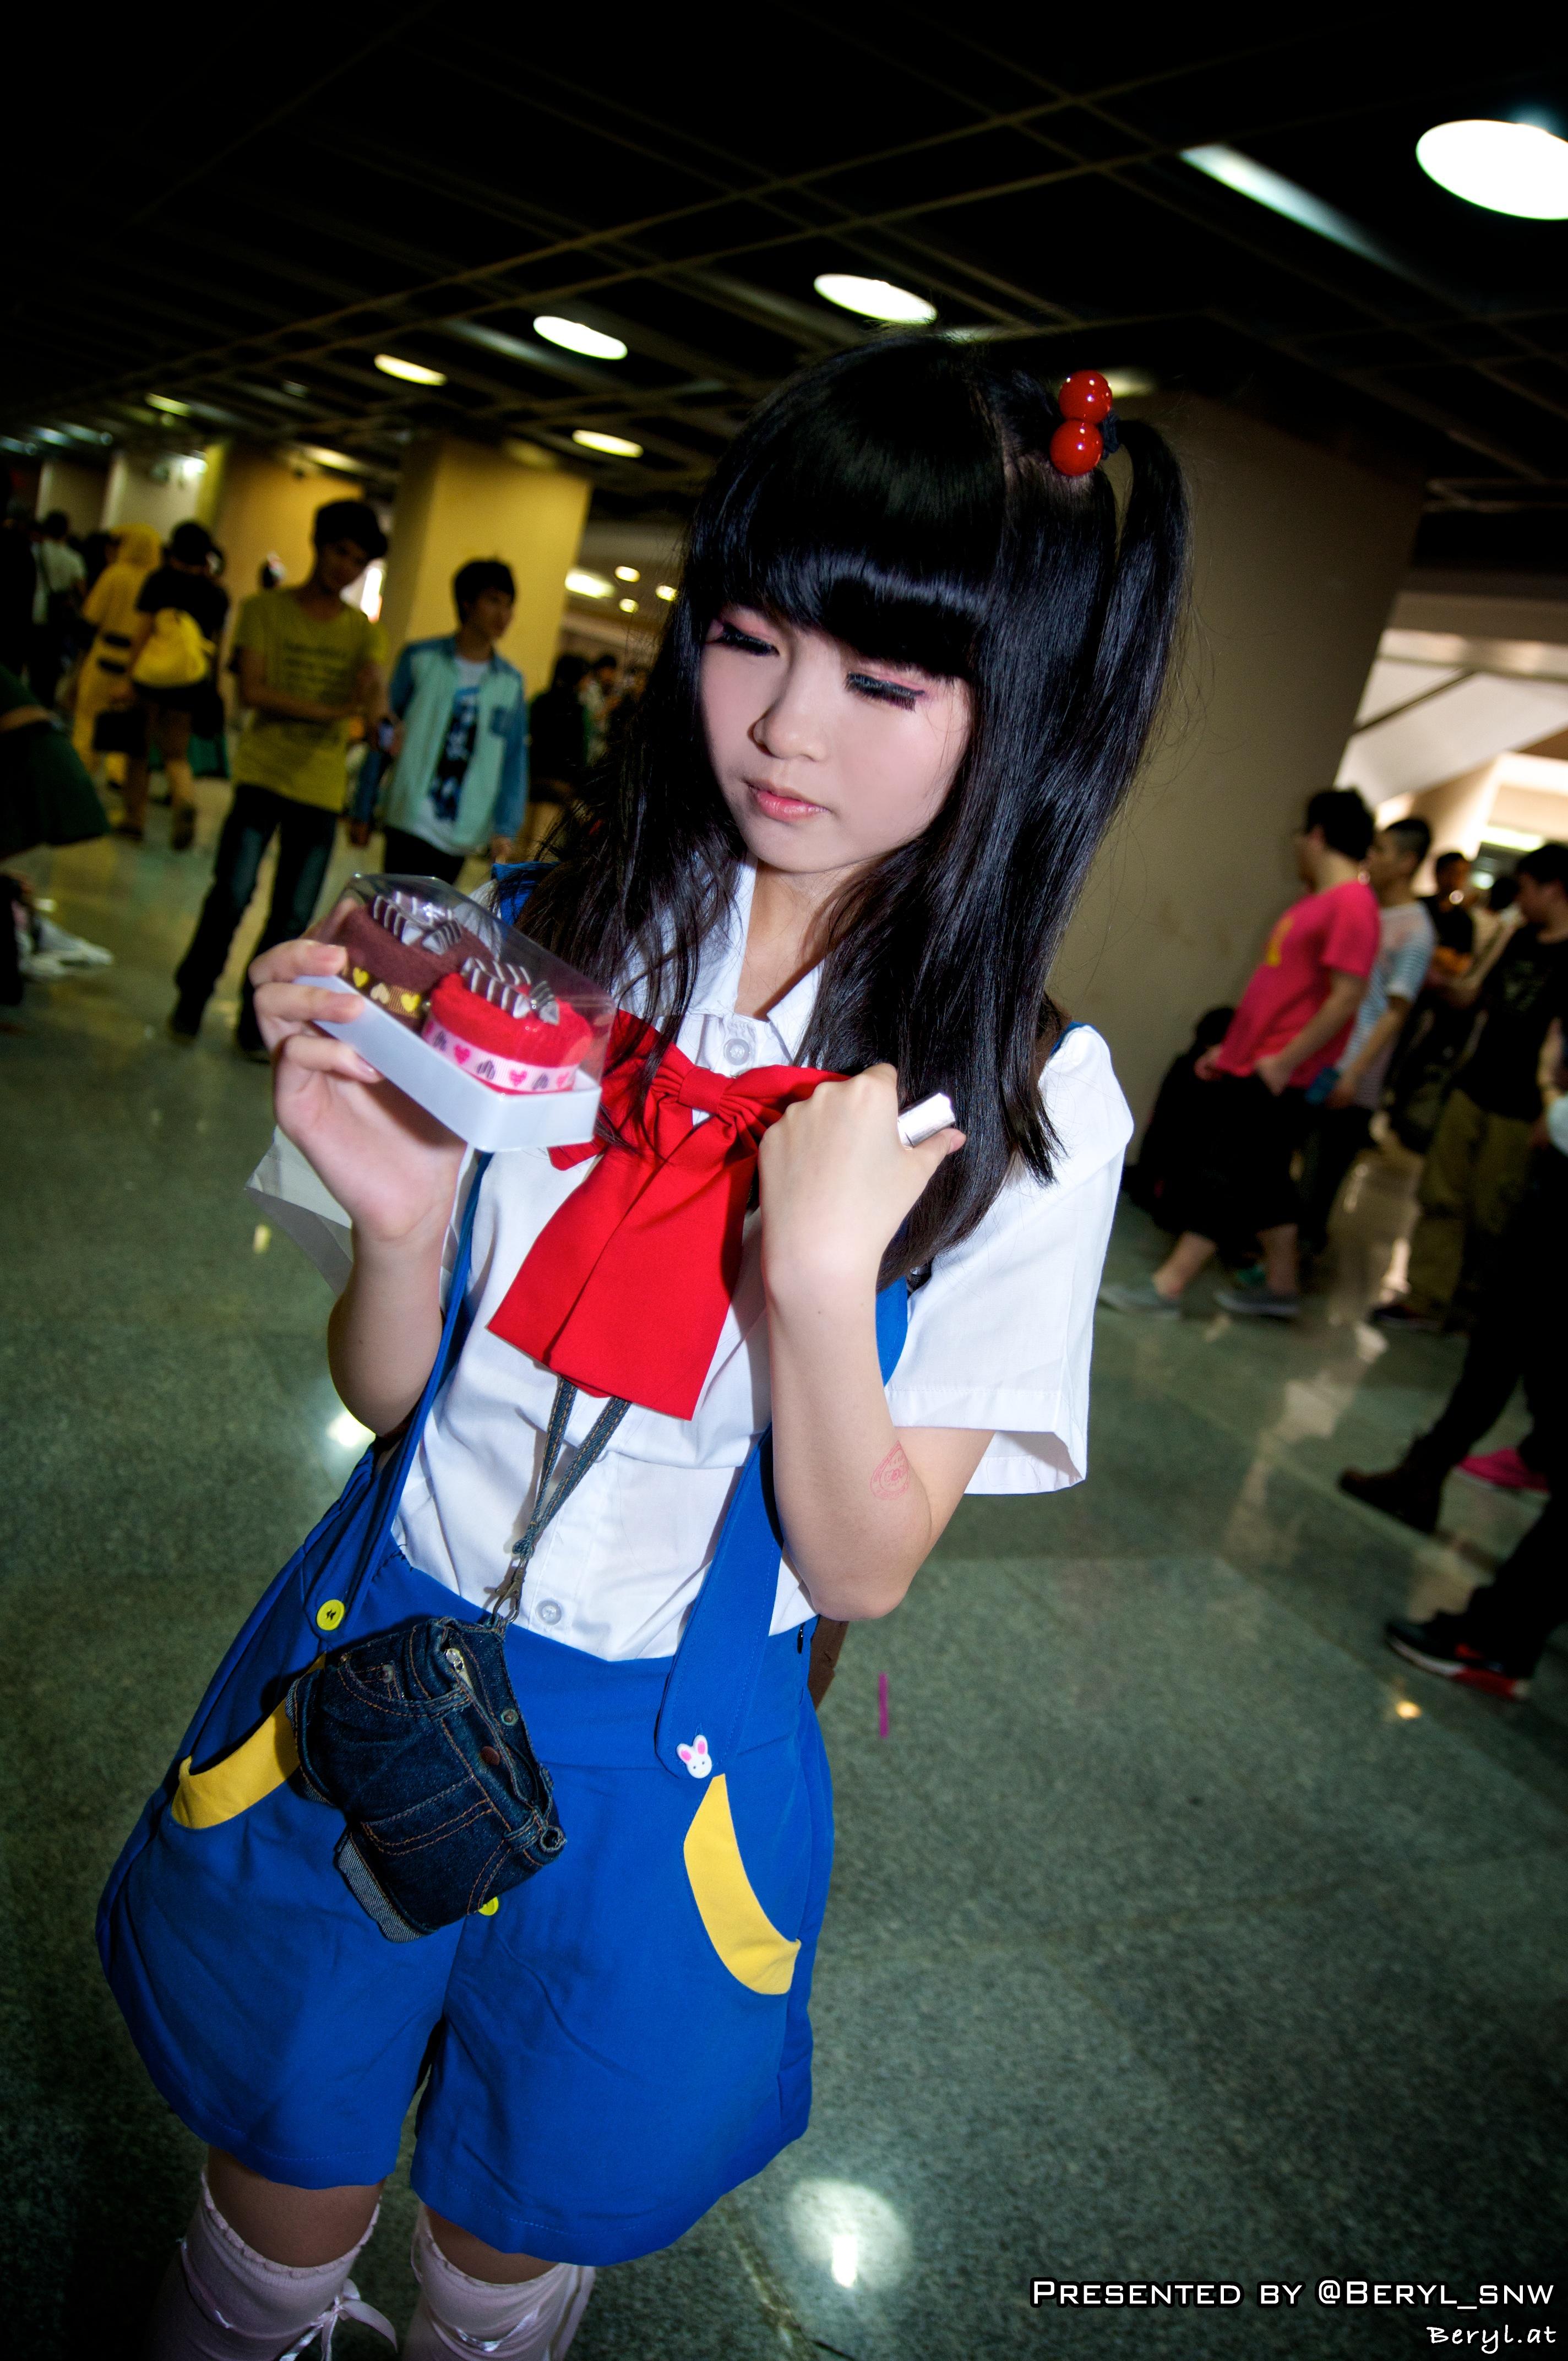 Gambar Gadis Permainan Imut Pakaian Cosplay Jepang Kostum